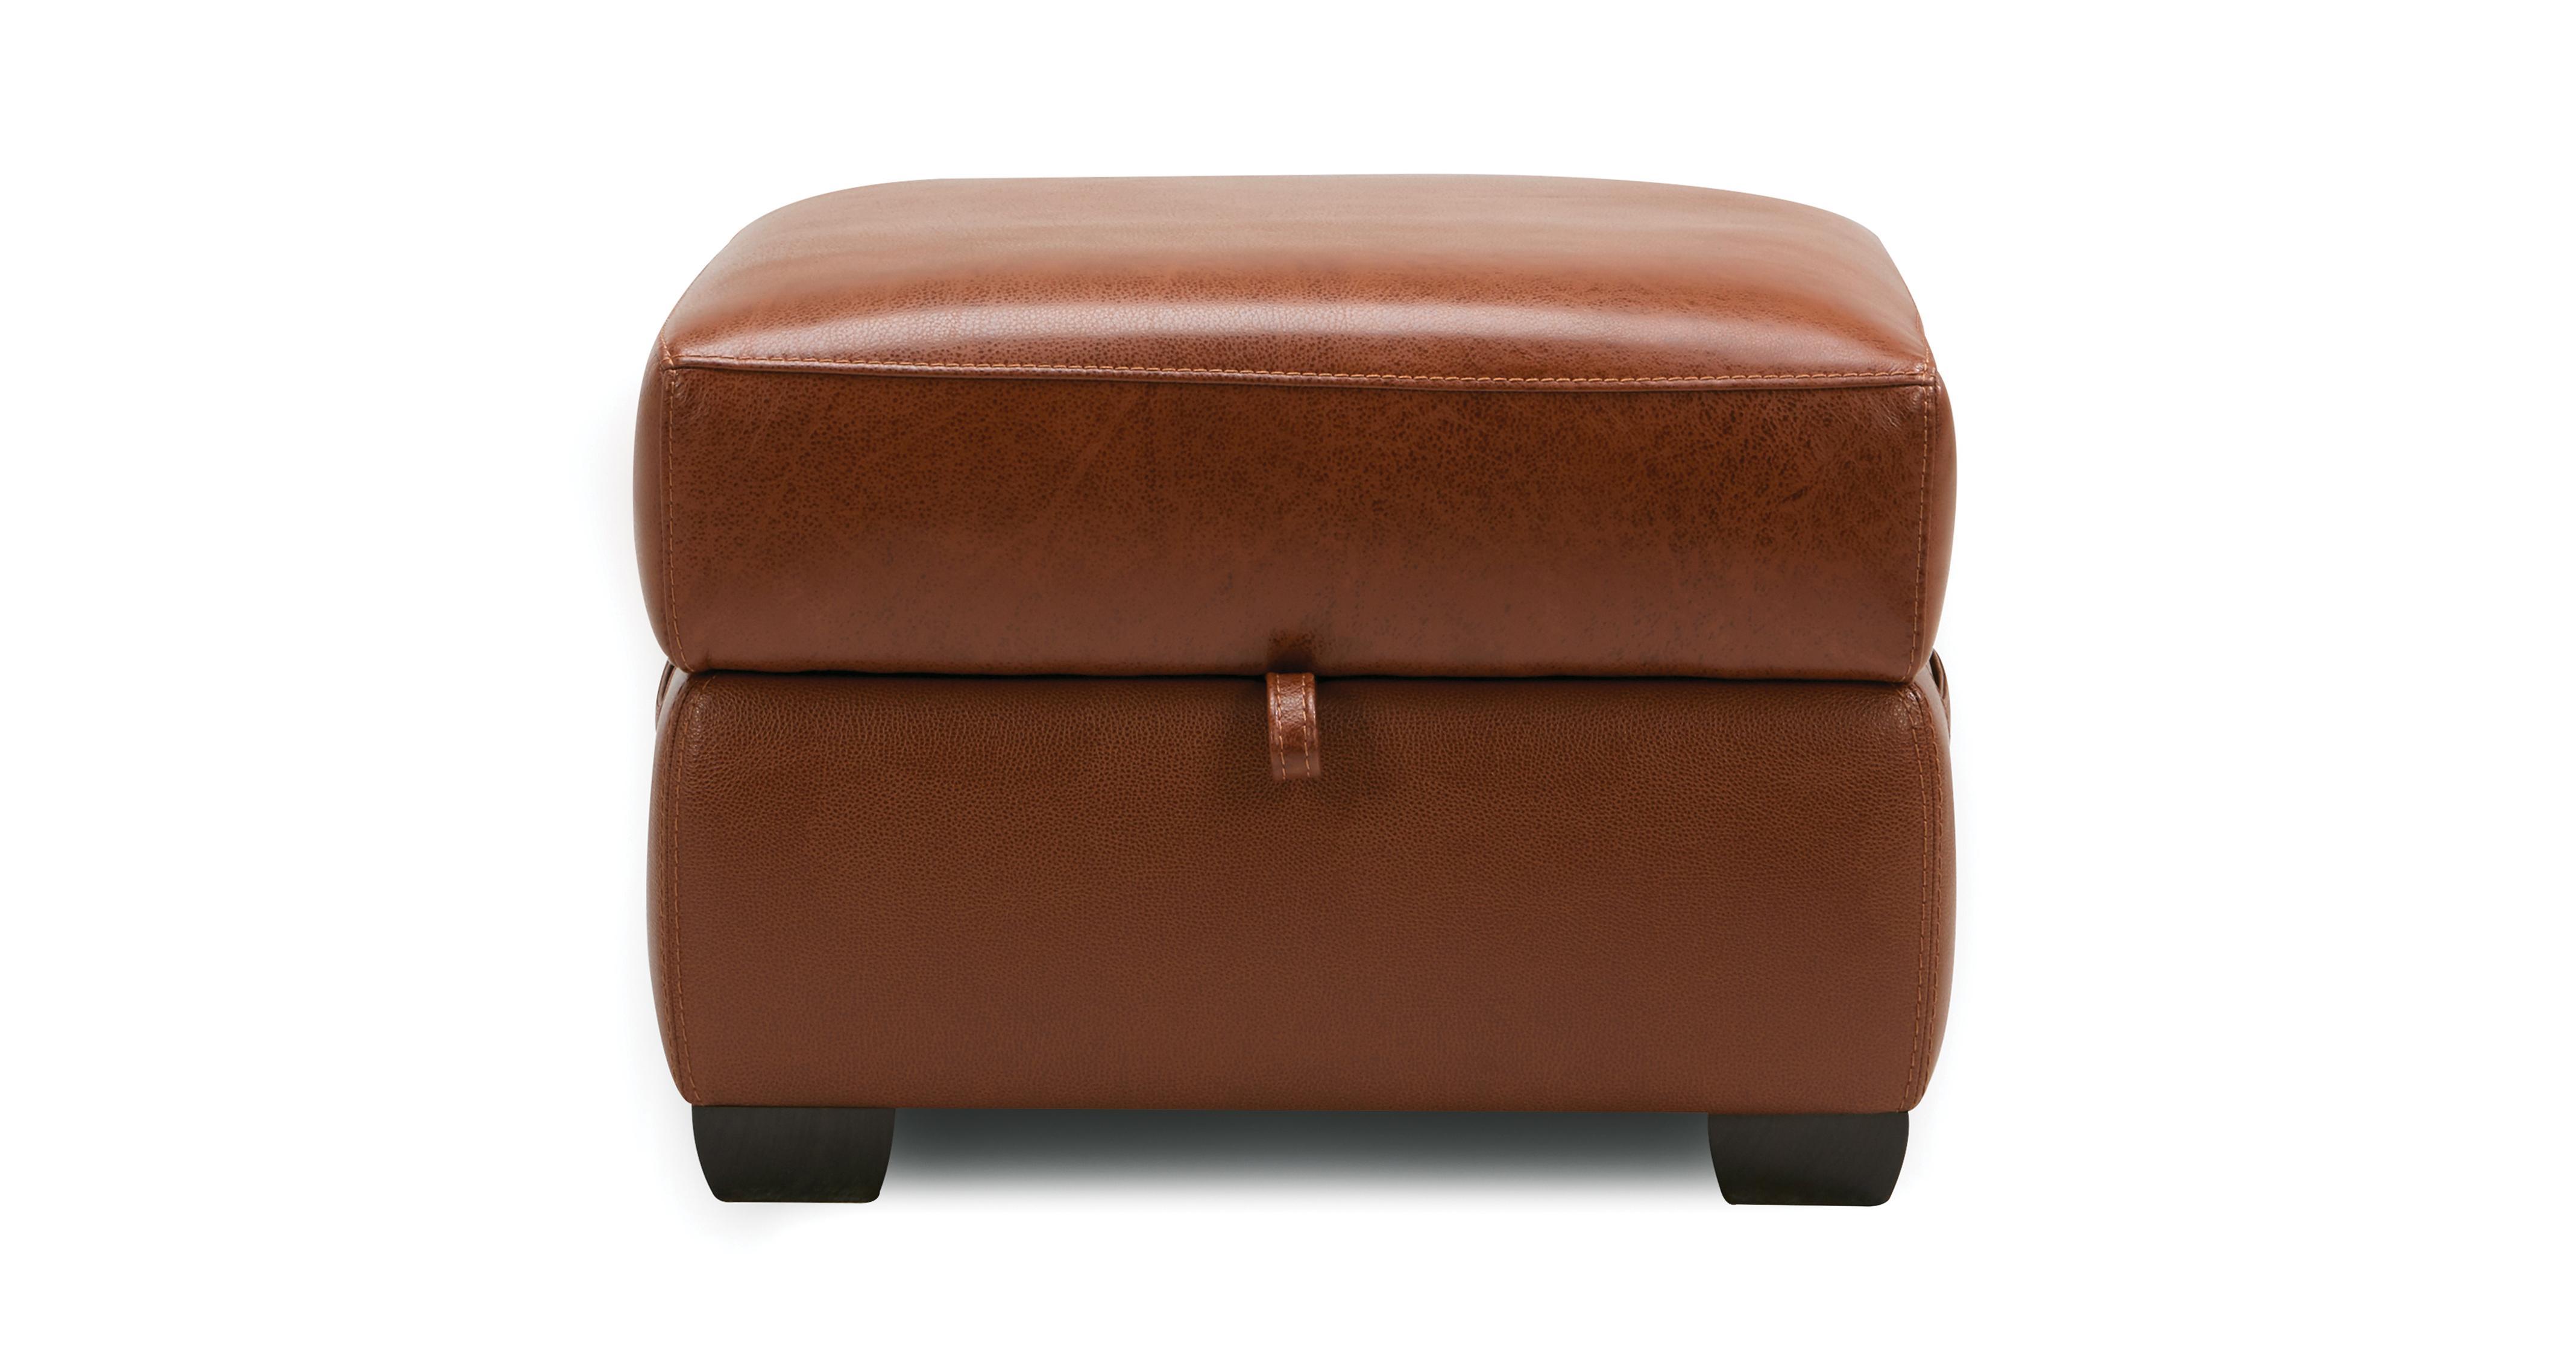 Braxton Leather Sofa Review | Baci Living Room